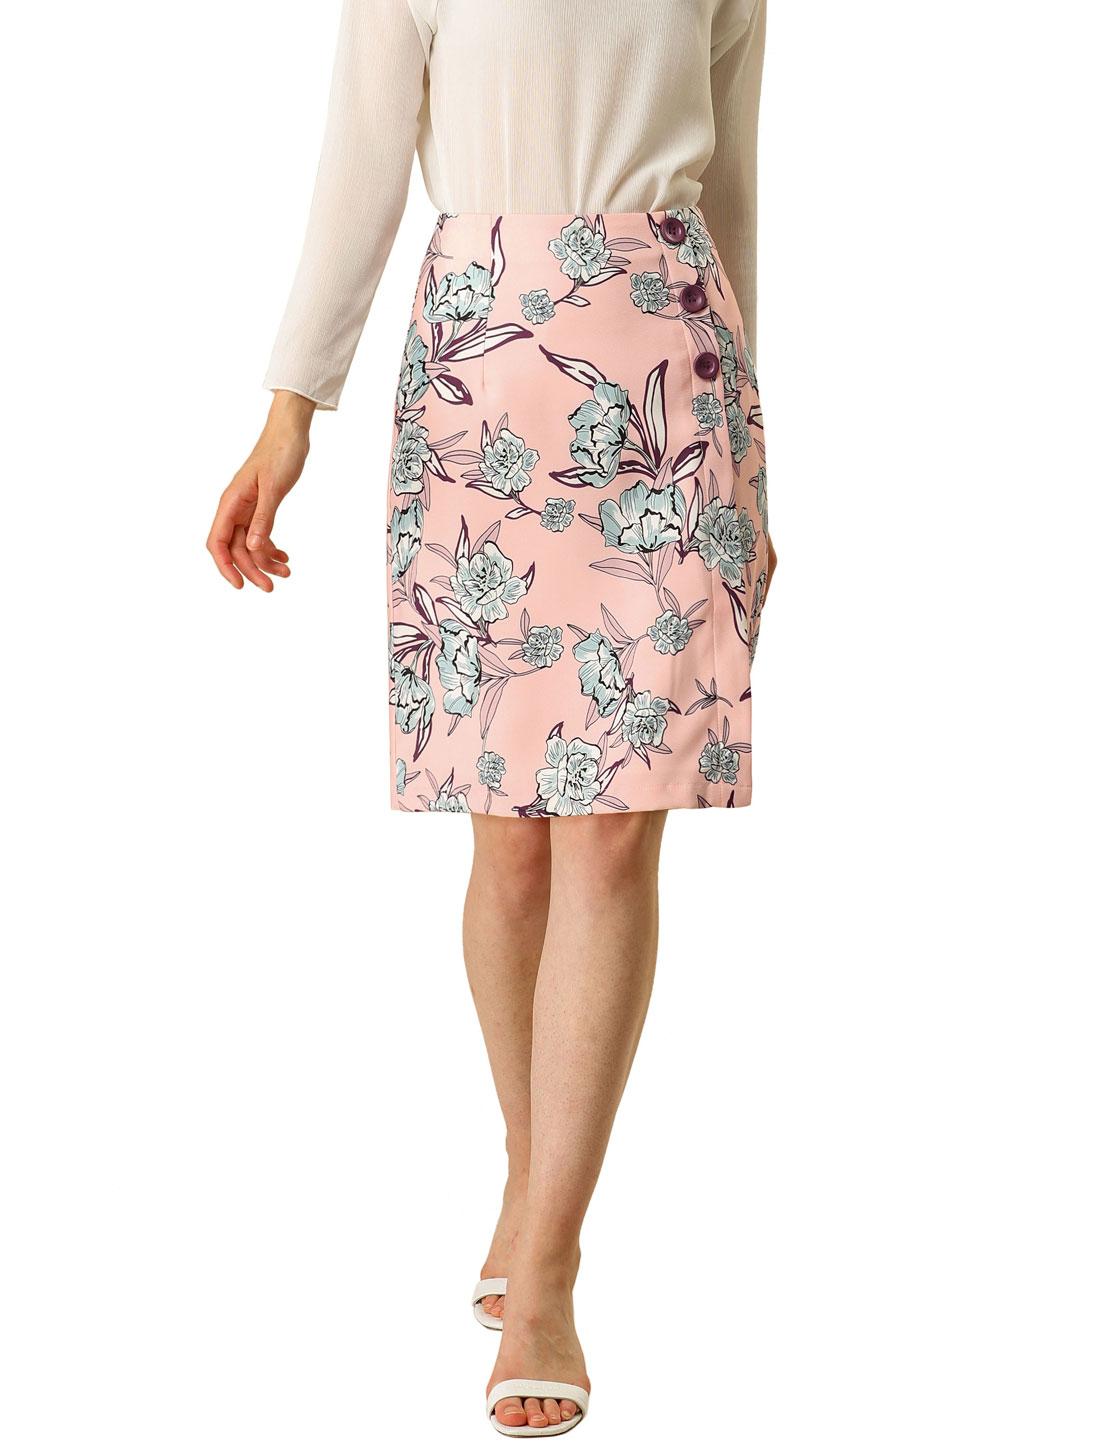 Allegra K Women's Work Elegant Floral Button Decor High Waist Skirt Pink L